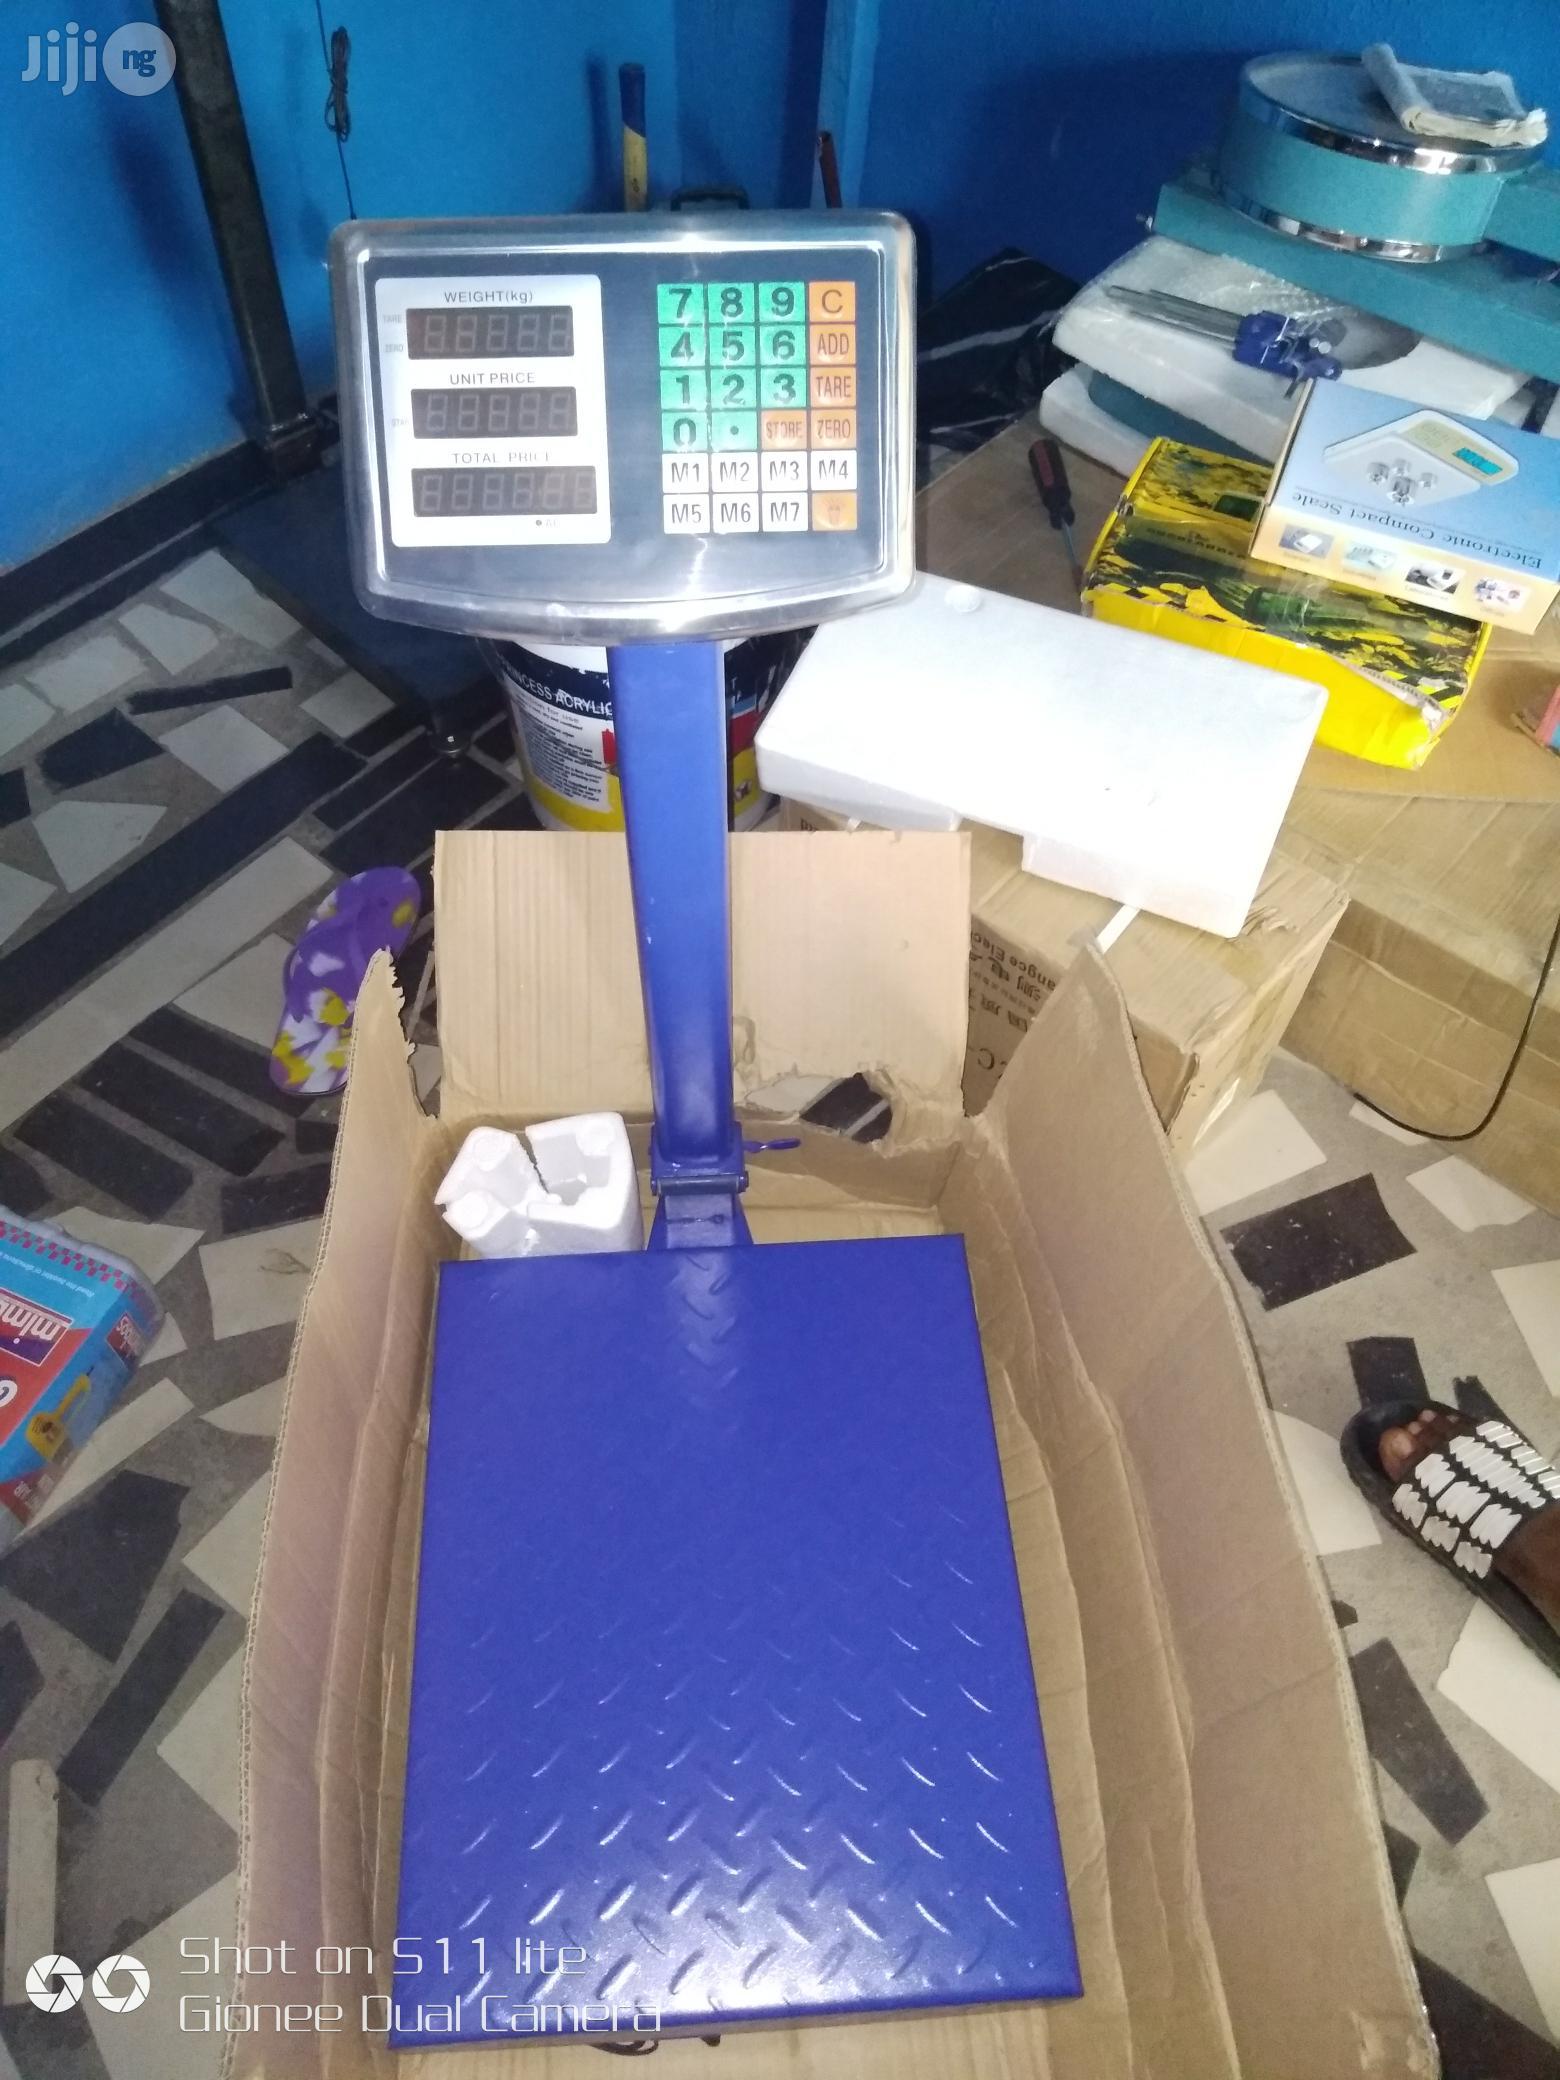 100kg Digital Scale | Store Equipment for sale in Amuwo-Odofin, Lagos State, Nigeria